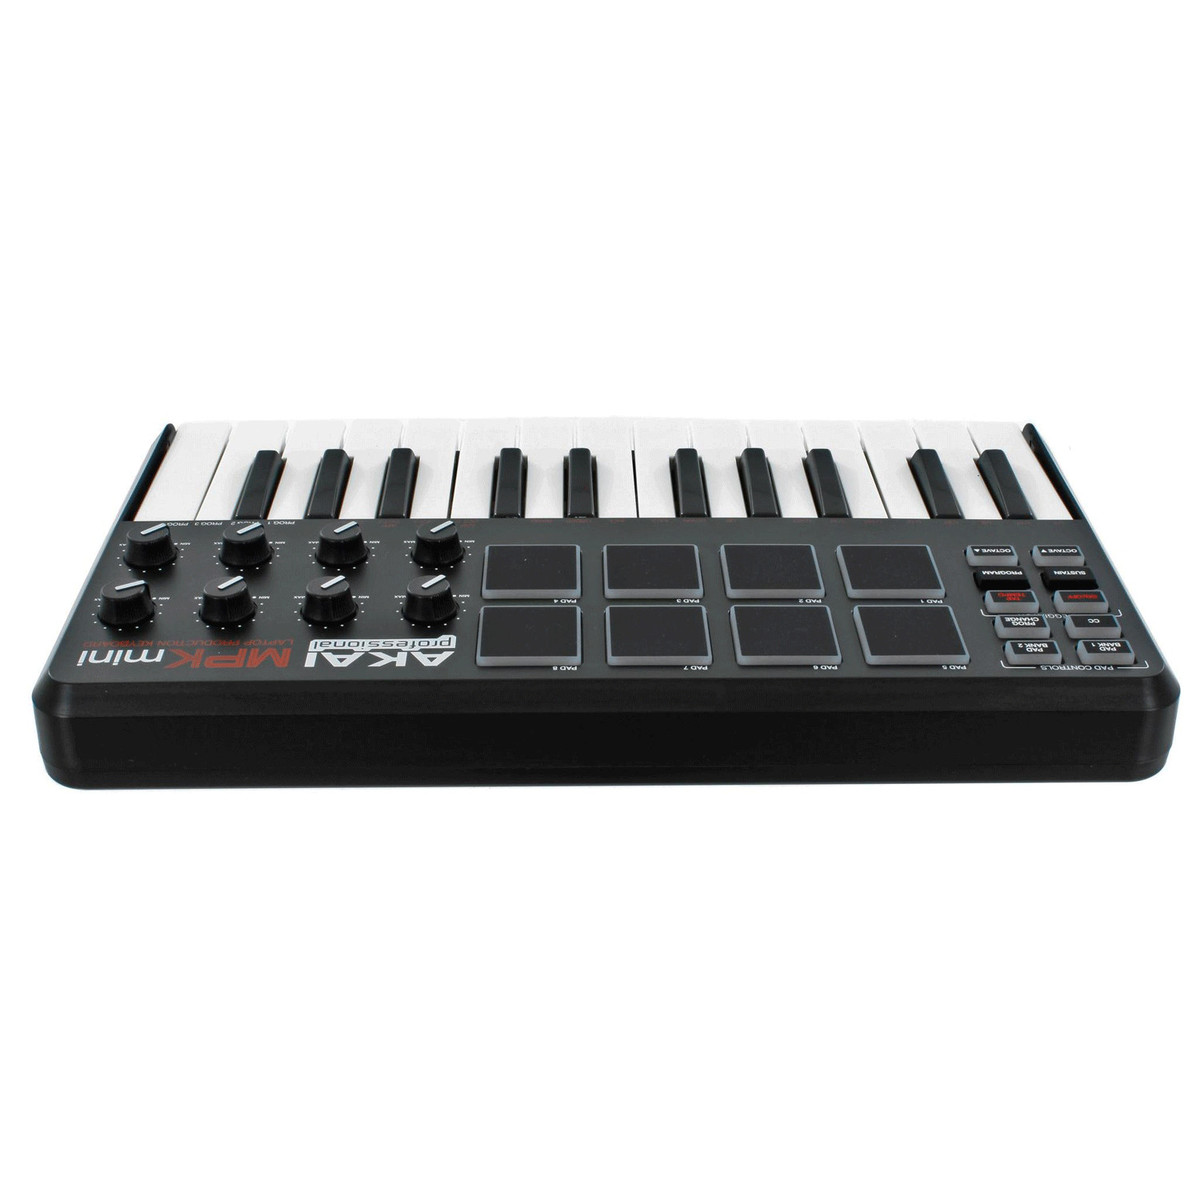 akai pro mpk mini usb midi keyboard with drum pads nearly new at gear4music. Black Bedroom Furniture Sets. Home Design Ideas